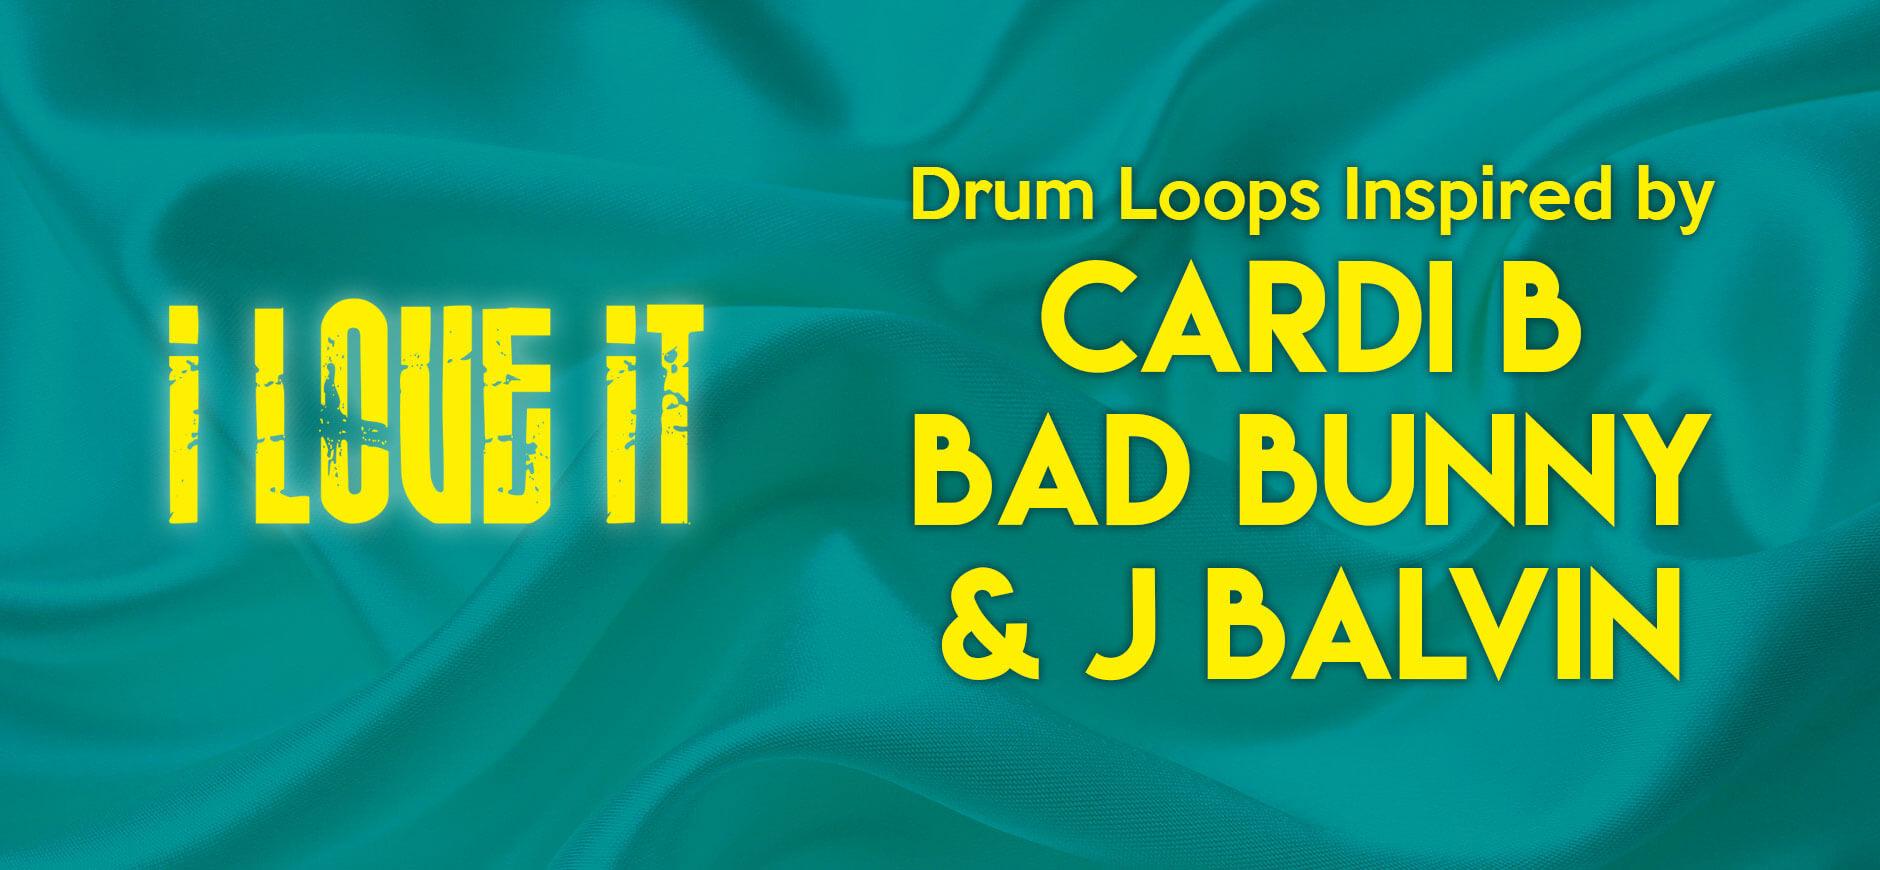 I Like It Drum Loops Inspired by Cardi B, Bad Bunny, & J Balvin